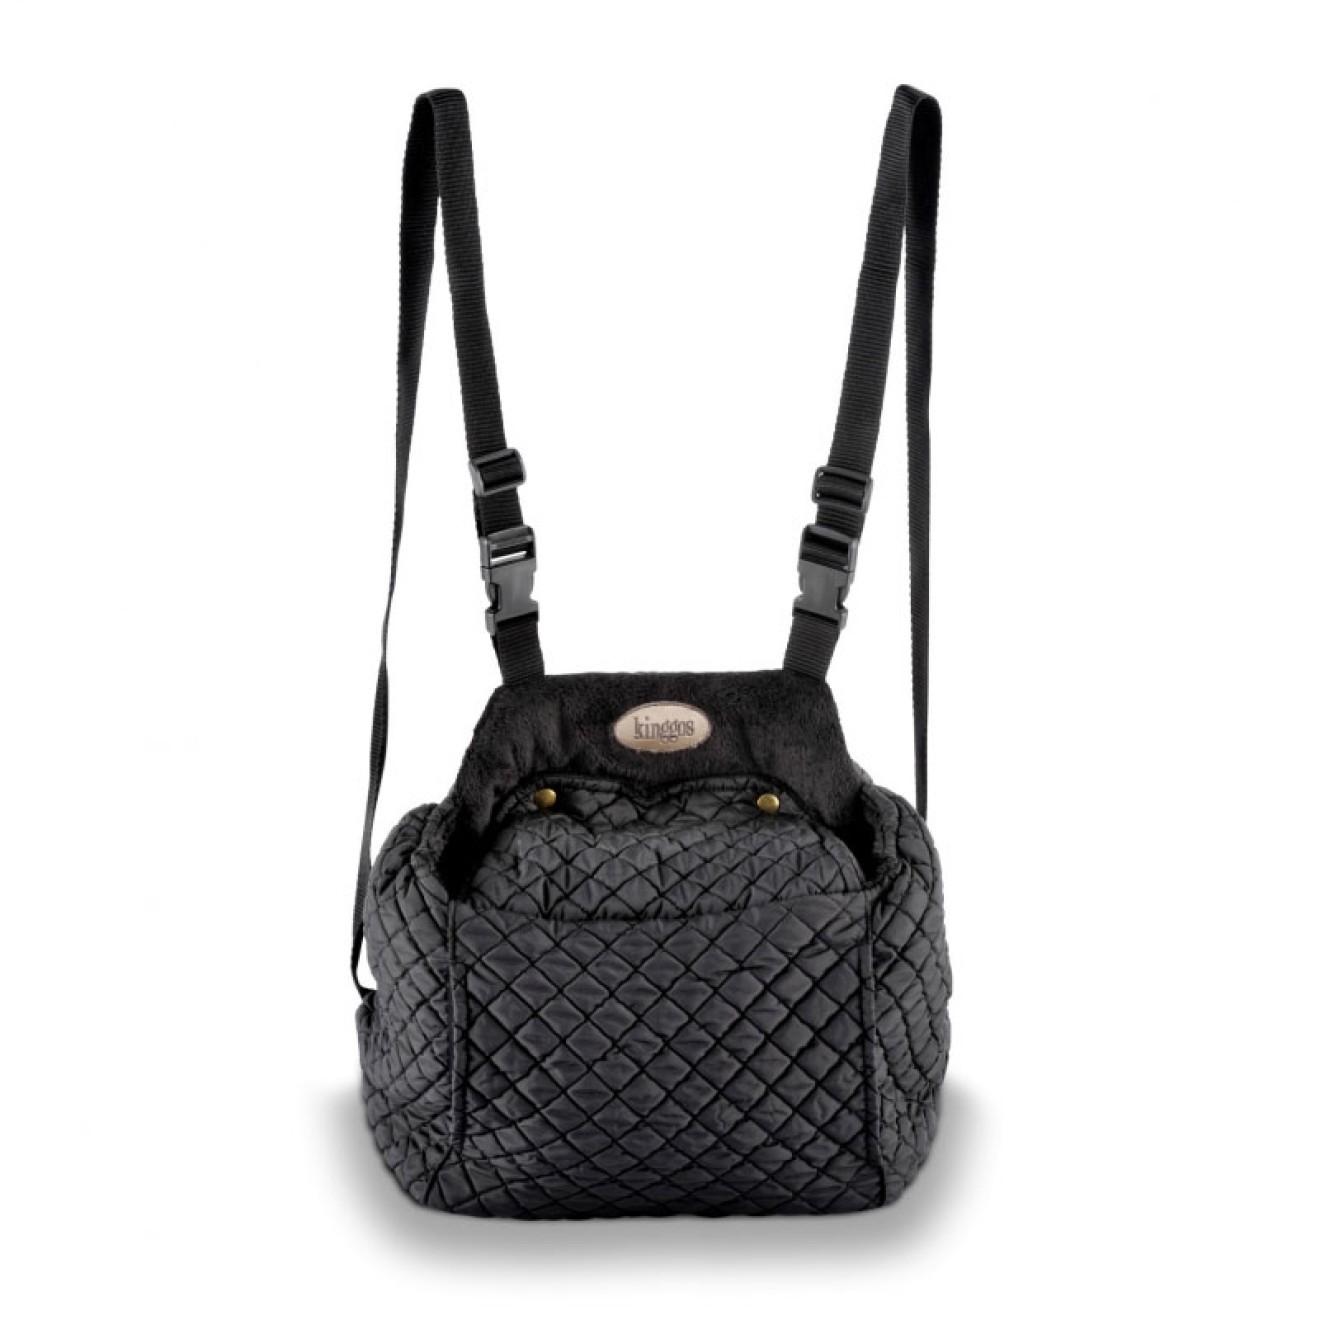 kinggos luxus hunderucksack fronttasche black online kaufen. Black Bedroom Furniture Sets. Home Design Ideas